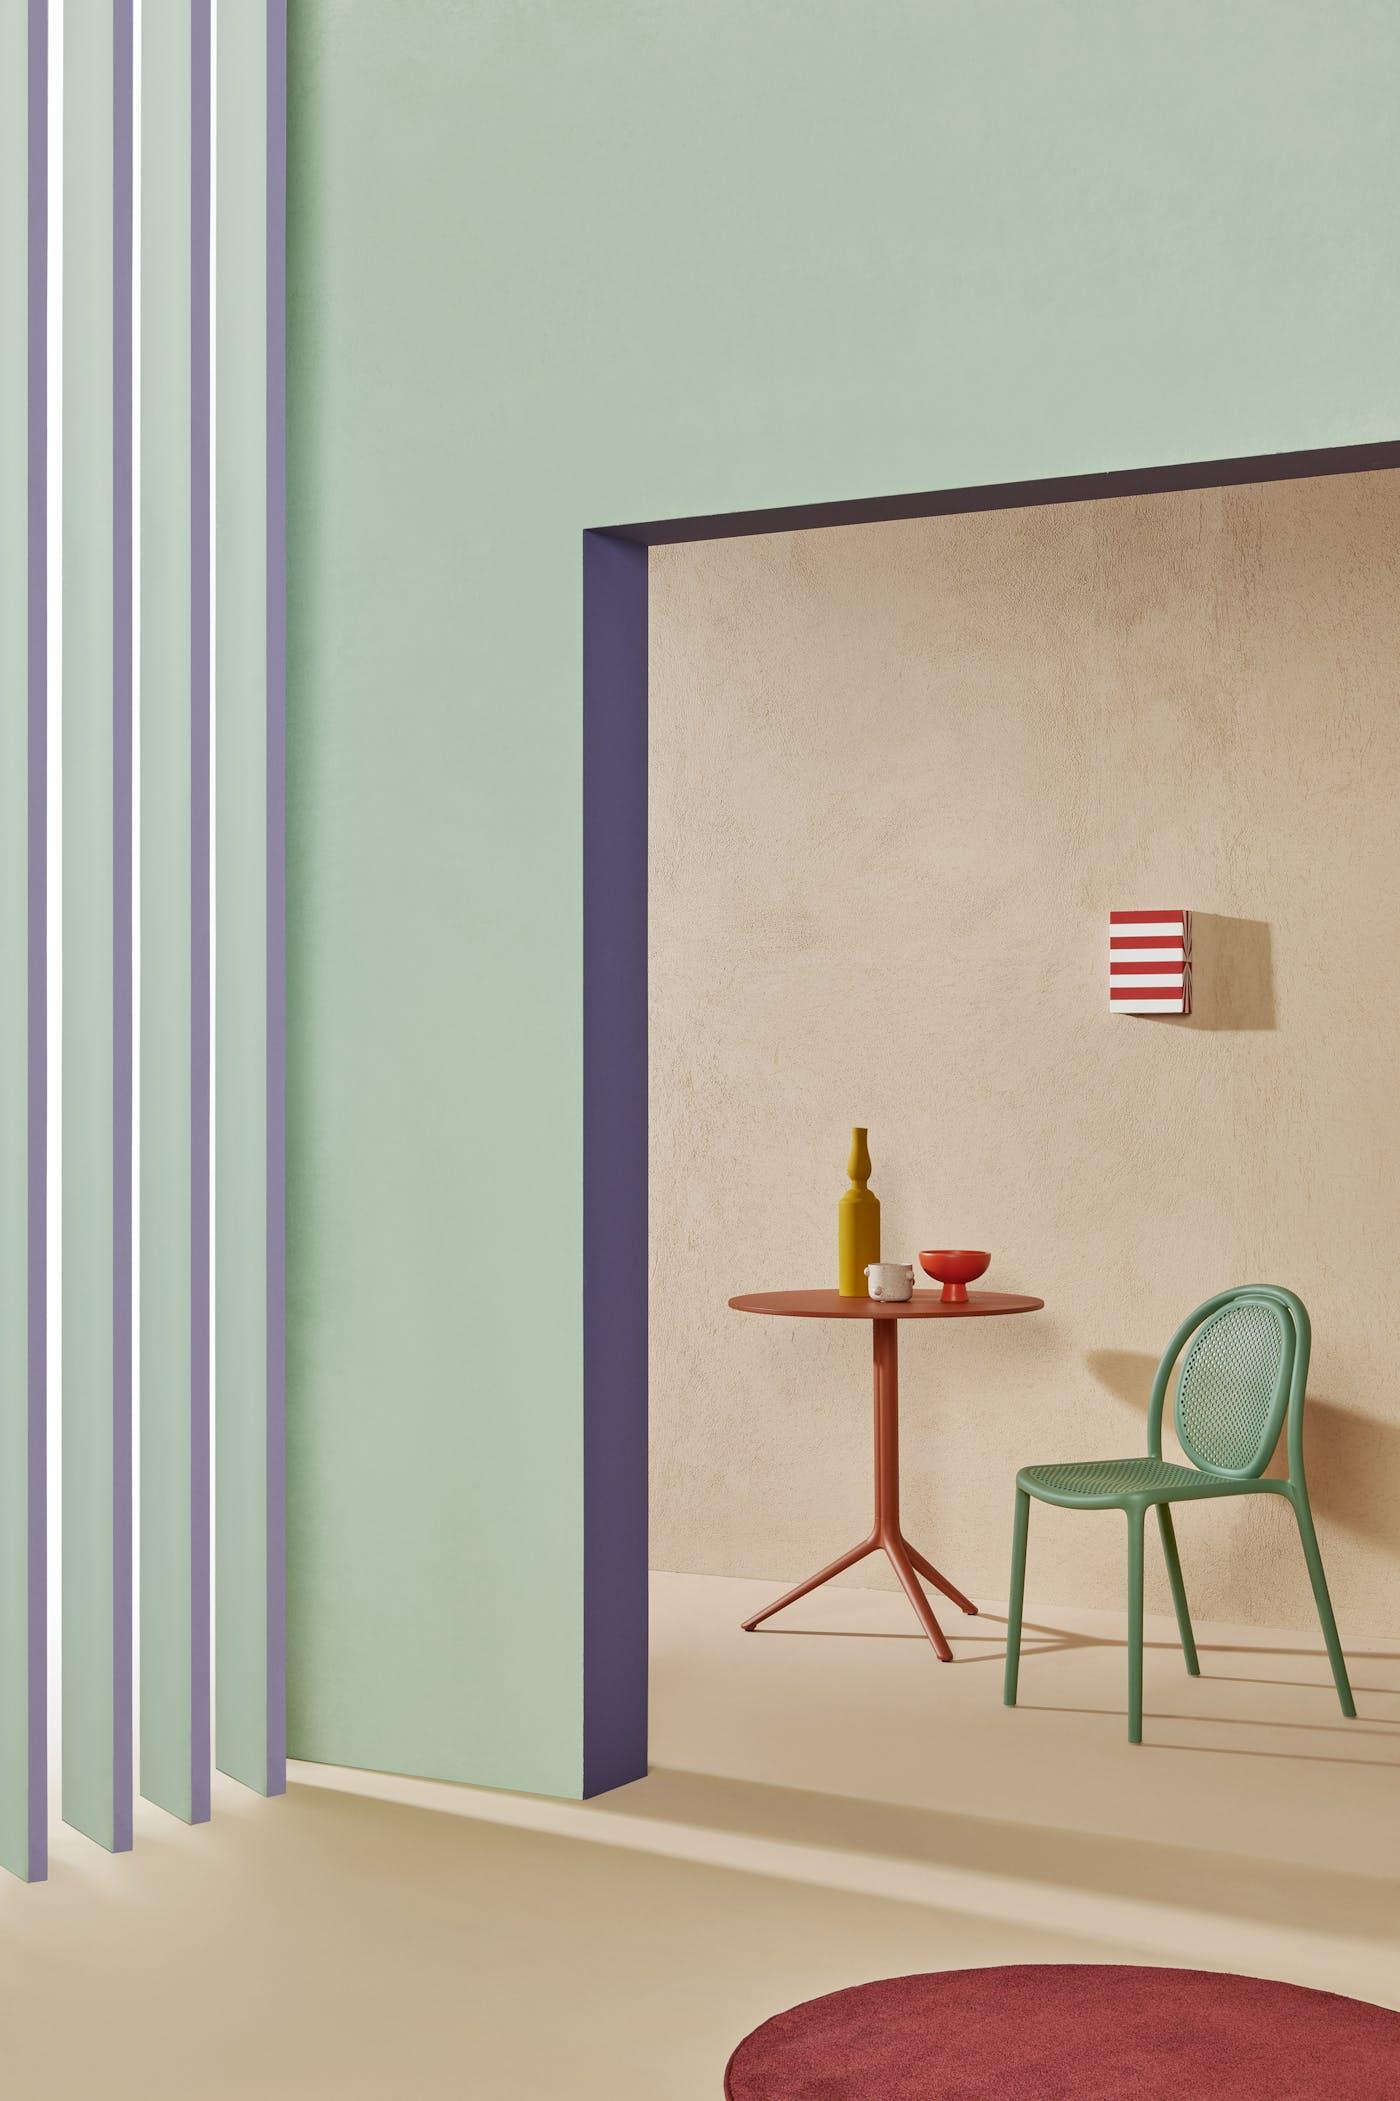 Pedrali Remind Chair Eugeni Quitllet art direction Studio FM photo Andrea Garuti